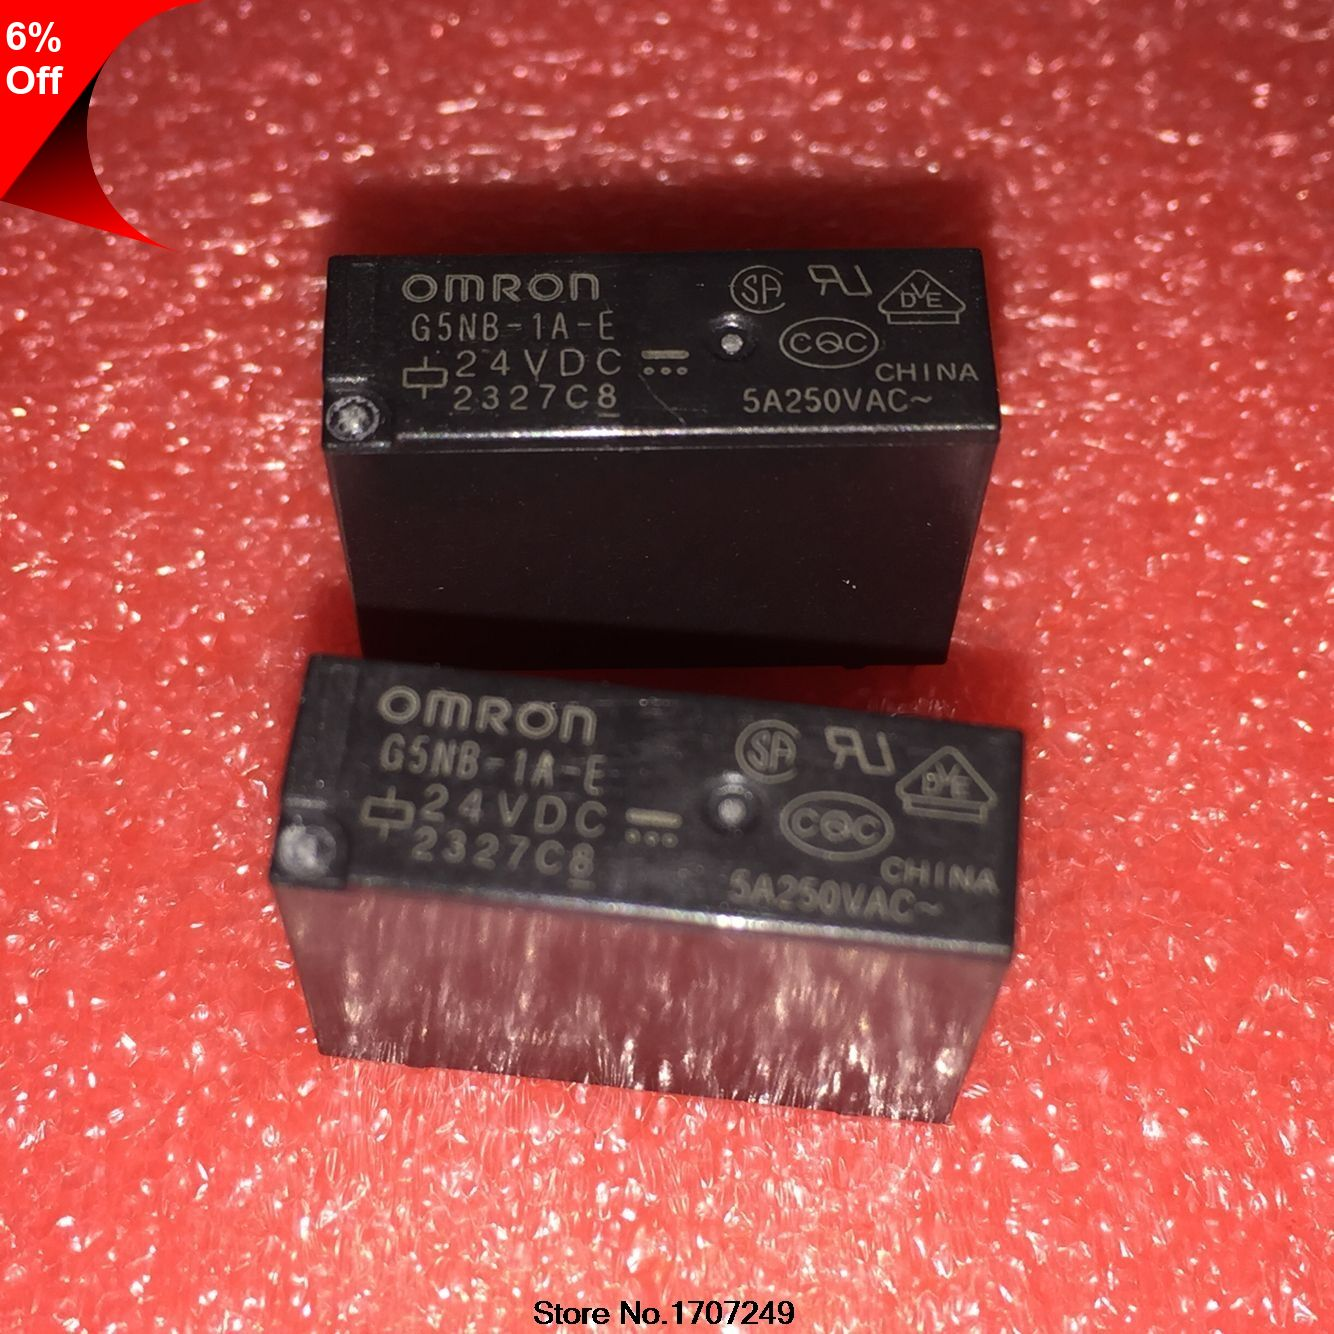 Only 7 99 Free Shipping 10pcs New Original Omron Relay G5nb 1a E 24vdc G5nb 1a E Dc24v G5nb 1a E 24v G5nb 1a E 24vdc 5a 4pin